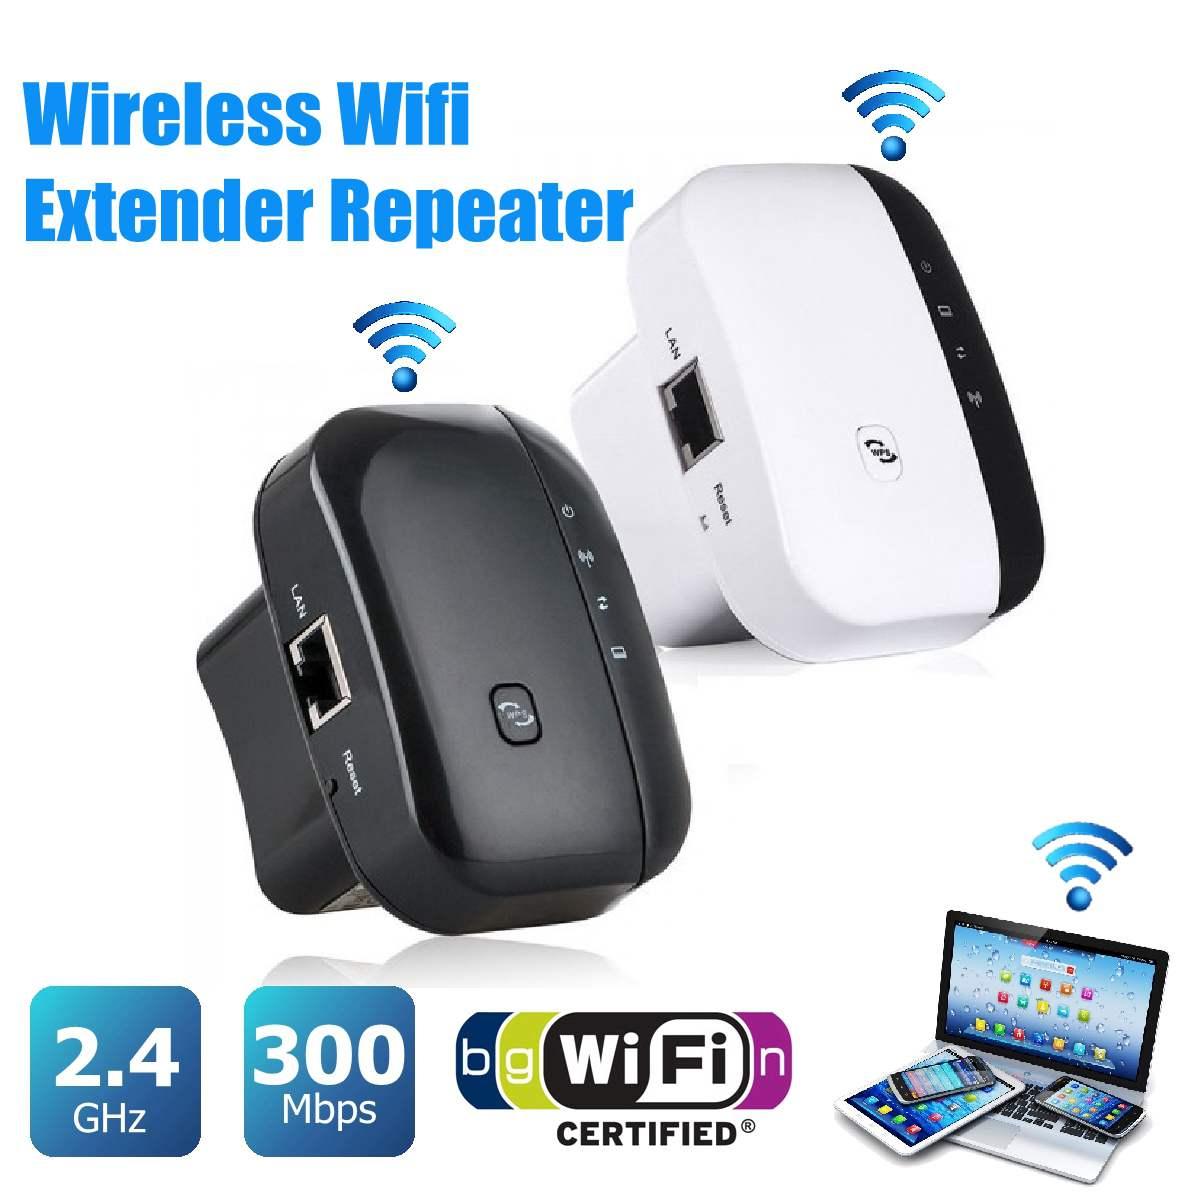 Wireless WiFi Repeater WiFi Extender 300Mbps Repiter Wifi Long Range Booster Wi-Fi Signal Amplifier AC 2.4G Ultraboost